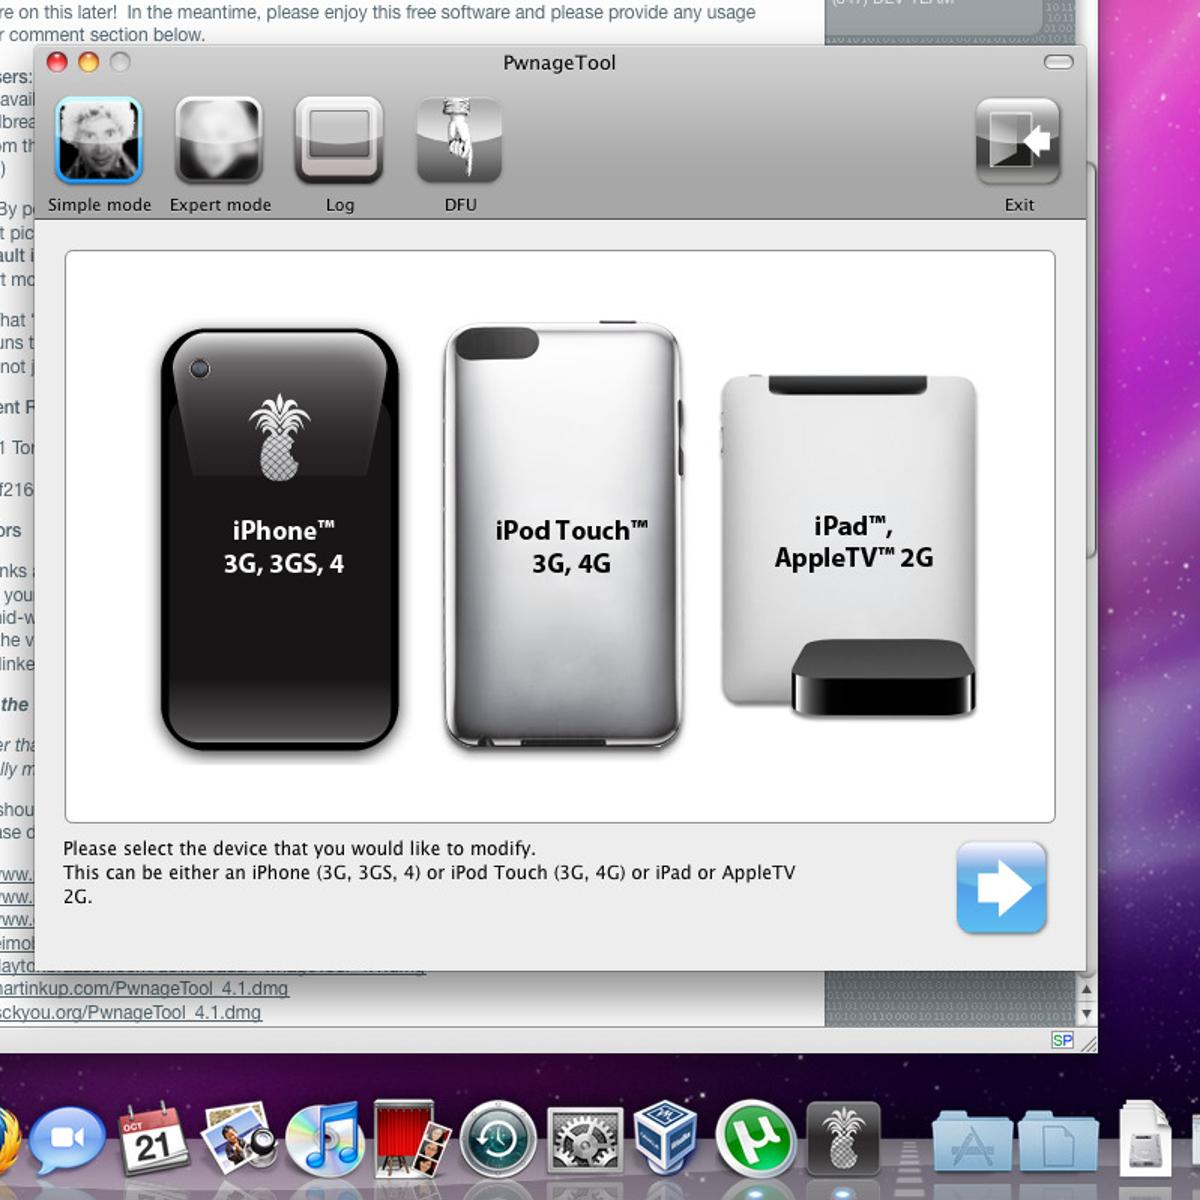 DFU режим iPhone: Как войти в режим DFU и зачем он нужен? » iPhone/iPad 74